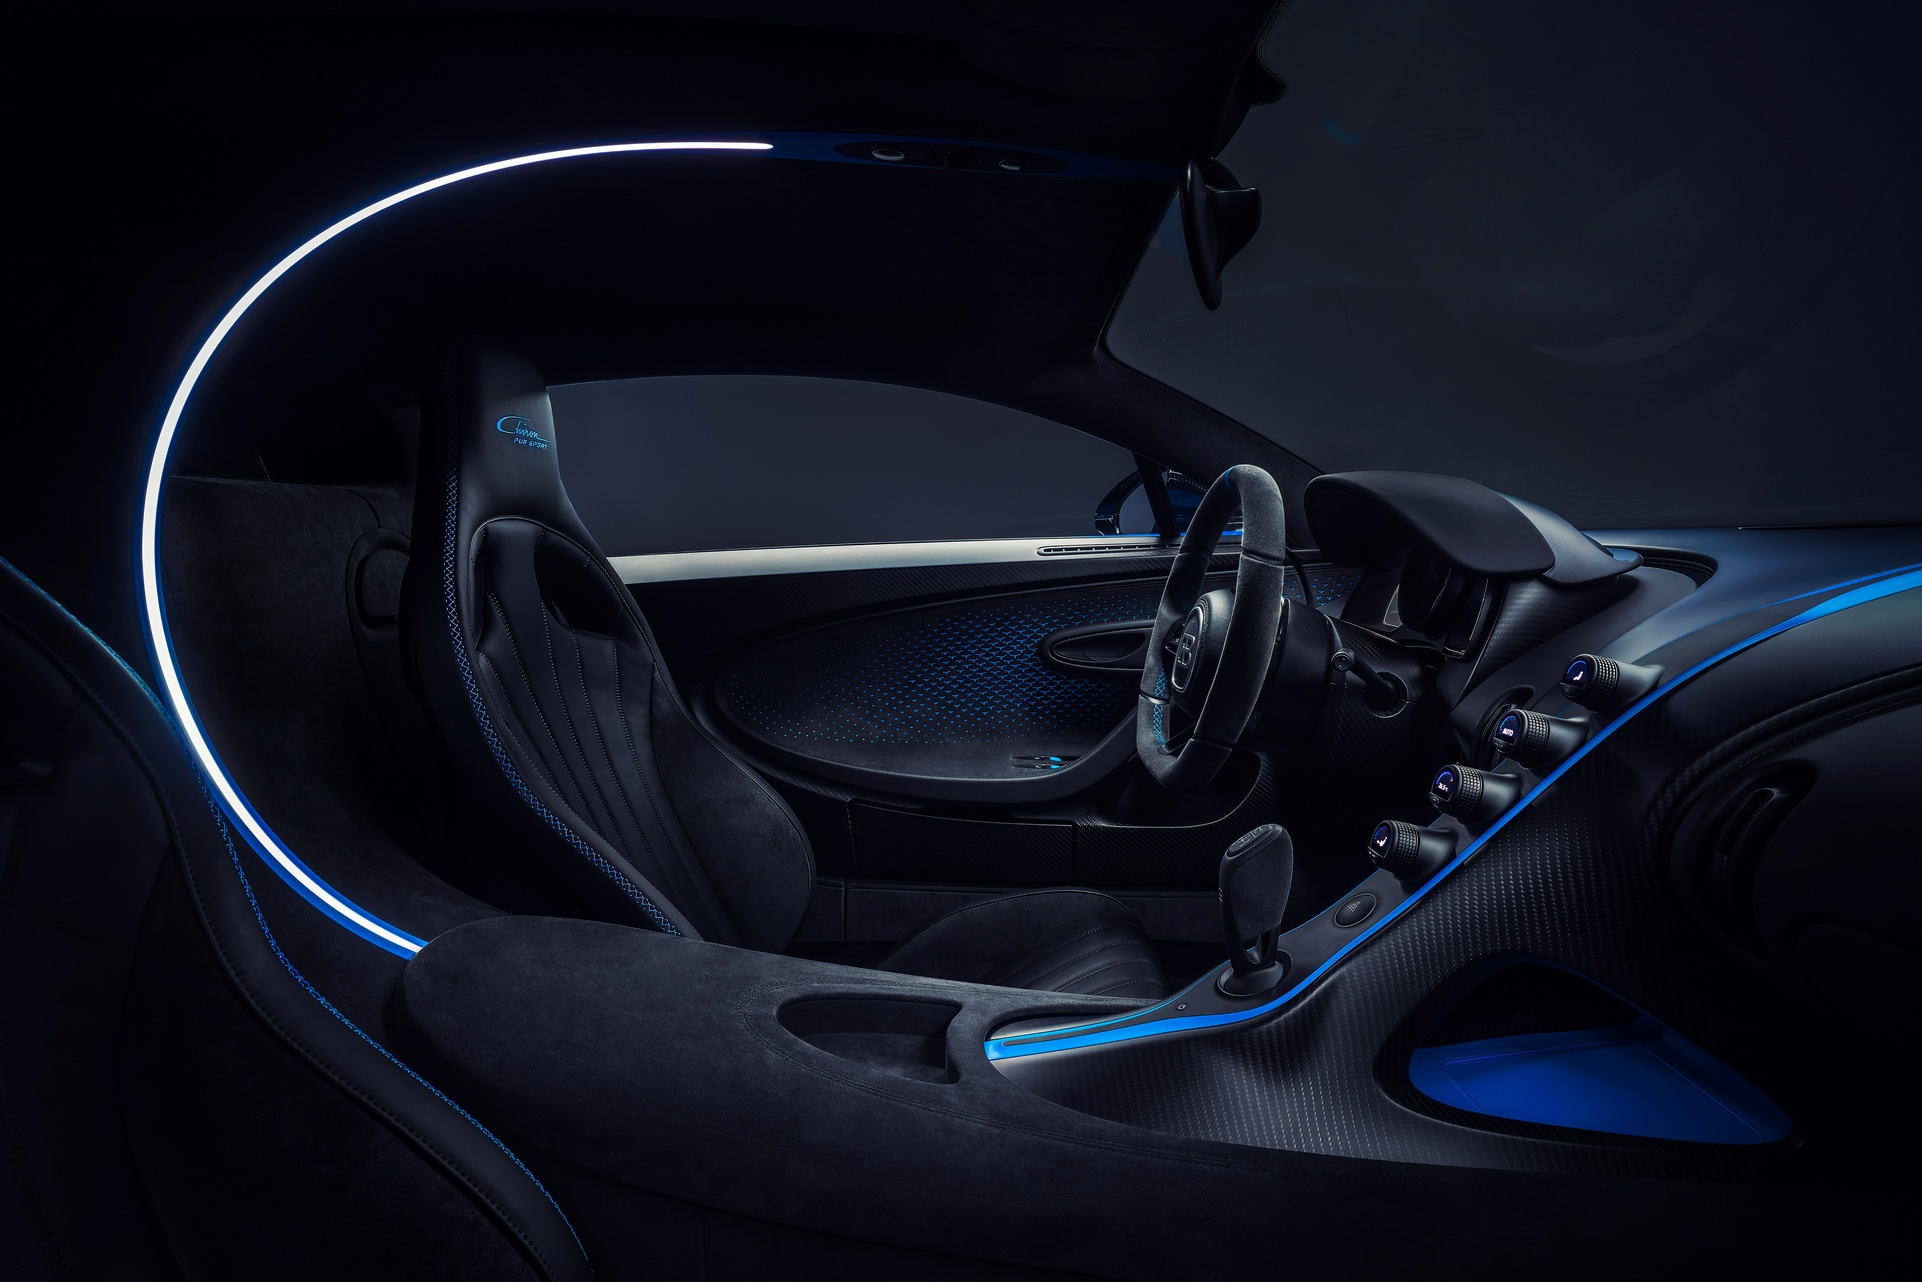 Bugatti Chiron phien ban moi ra mat - sieu xe gia 3,55 trieu USD hinh anh 22 C2.jpg